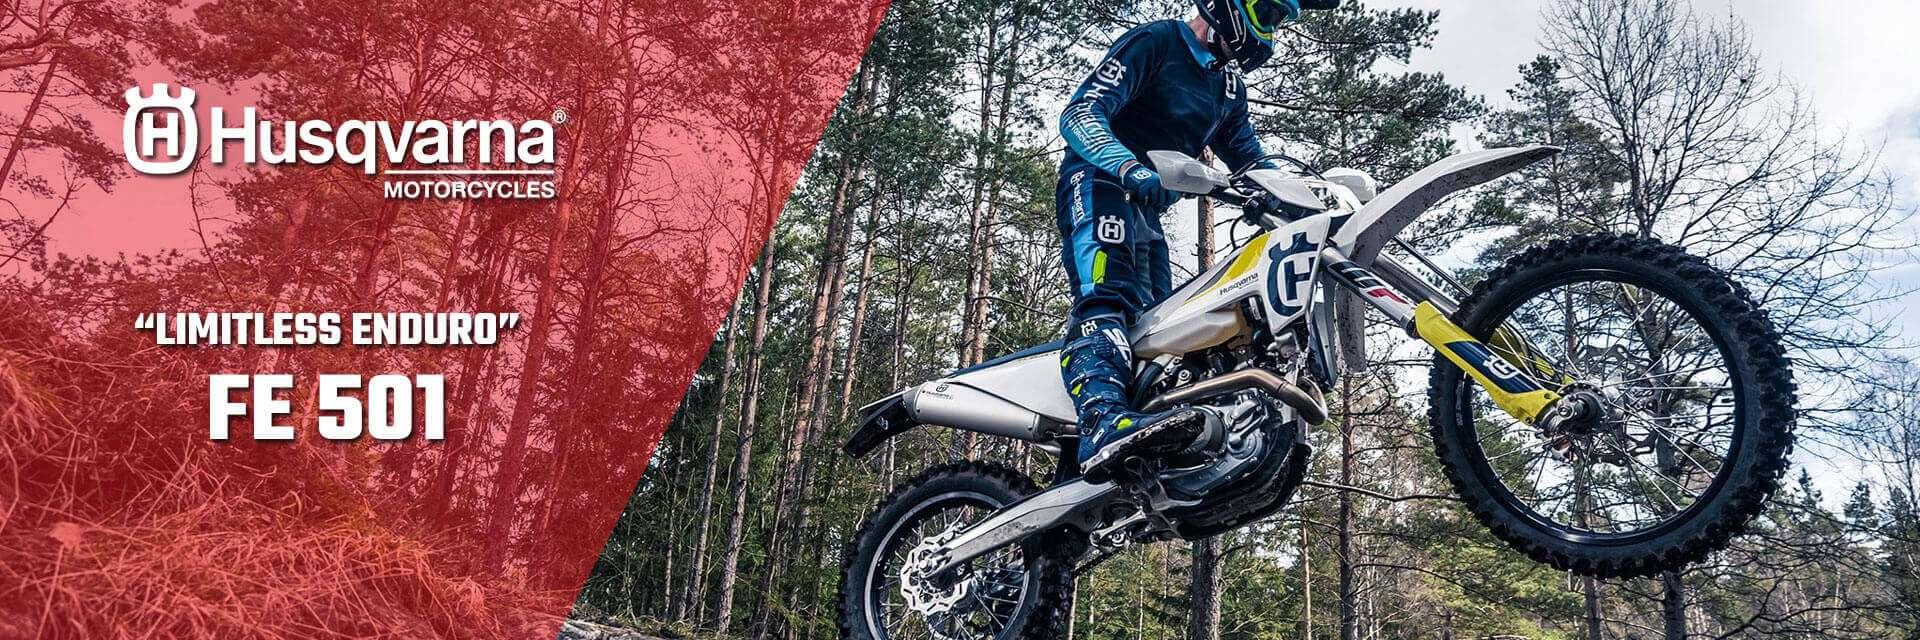 pacific motorsports eureka ca motorcycles atvs utvs for sale